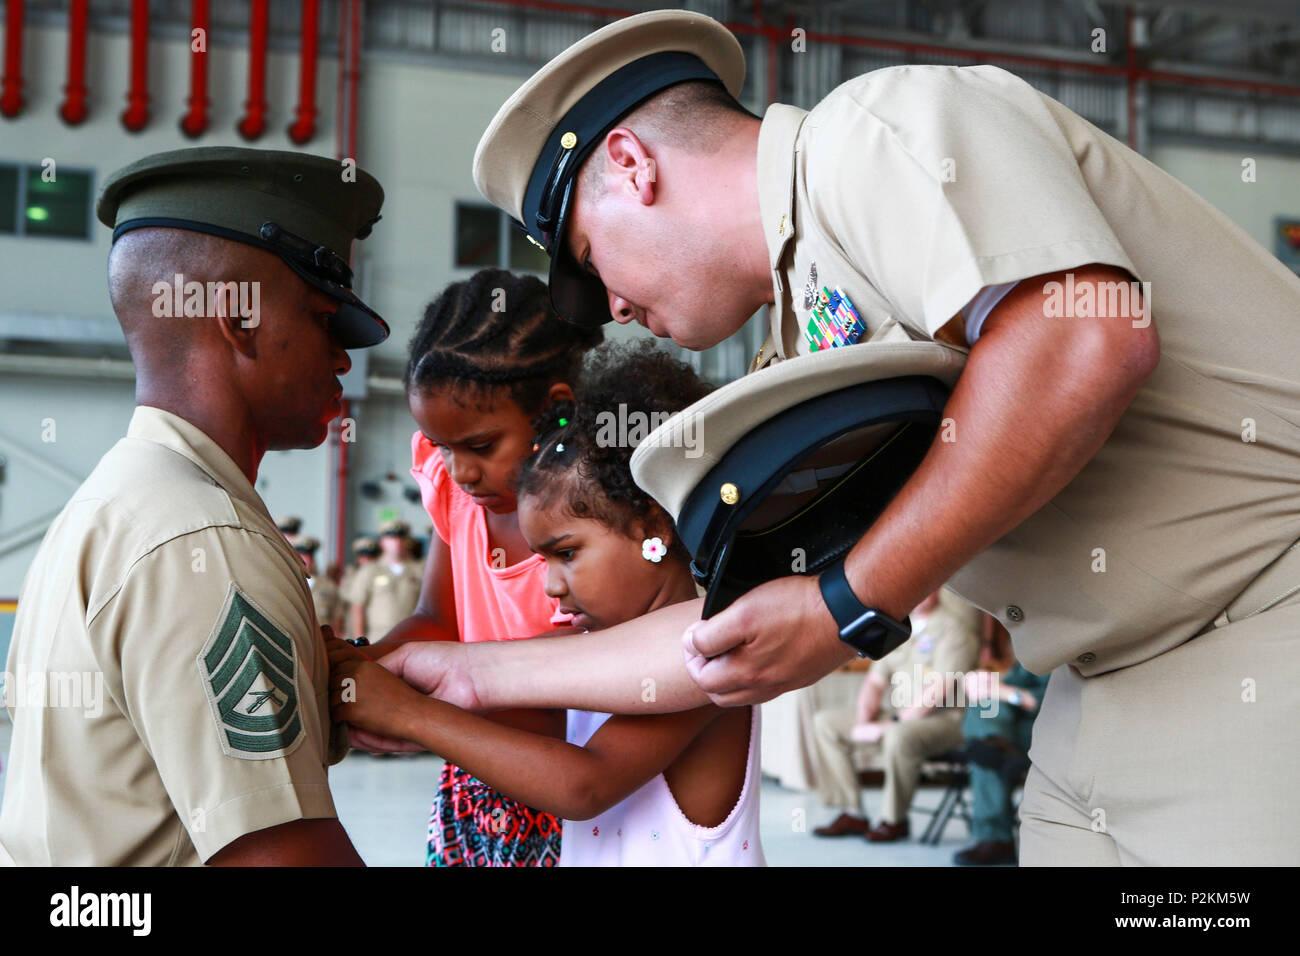 Marine Corps Base Hawaii Gunnery Stock Photos & Marine Corps Base